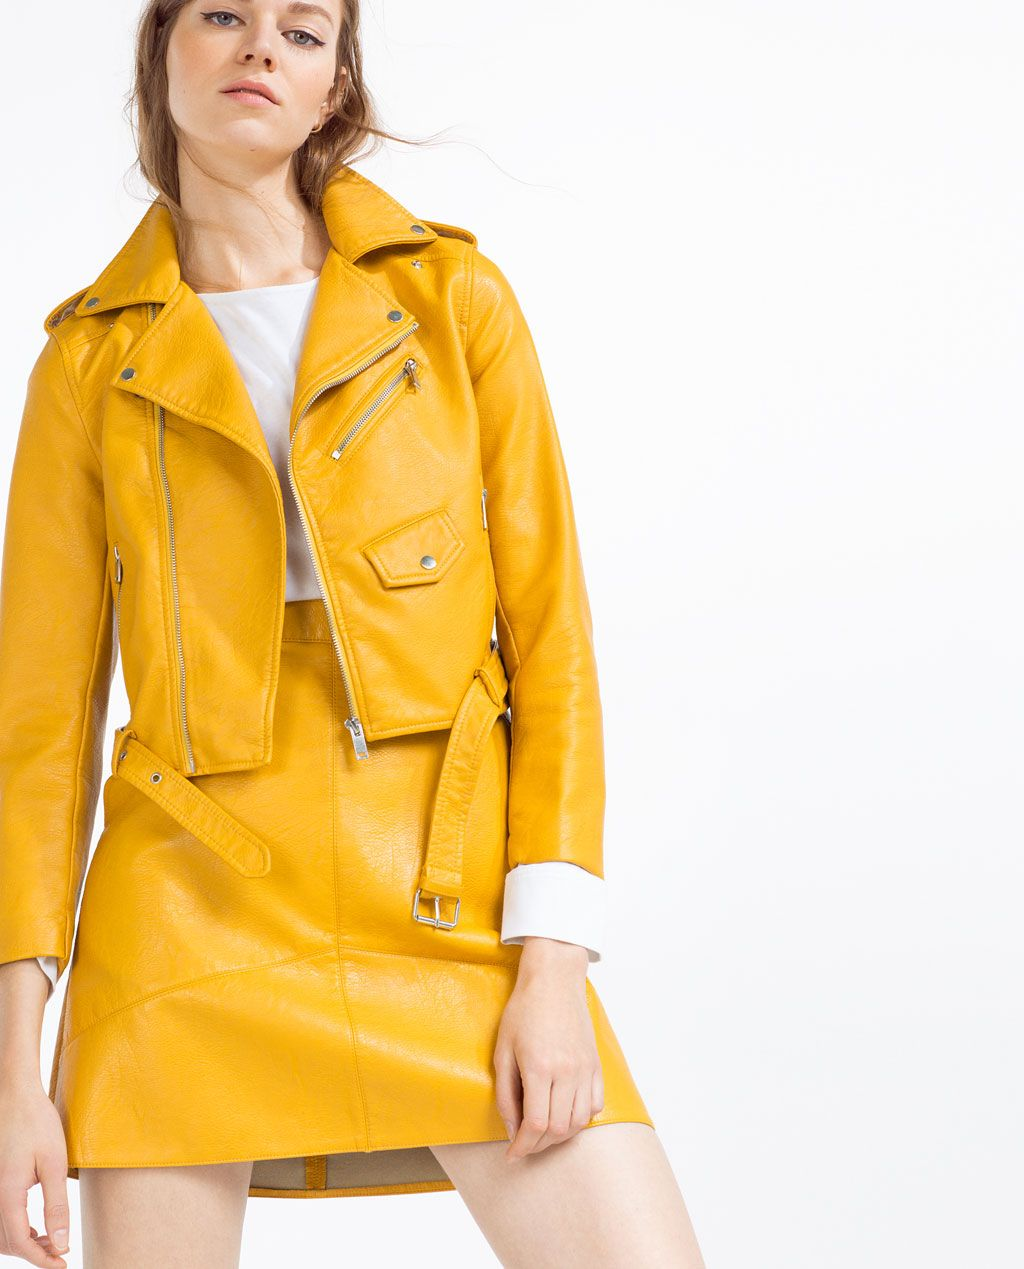 Chaqueta cuero zara amarilla